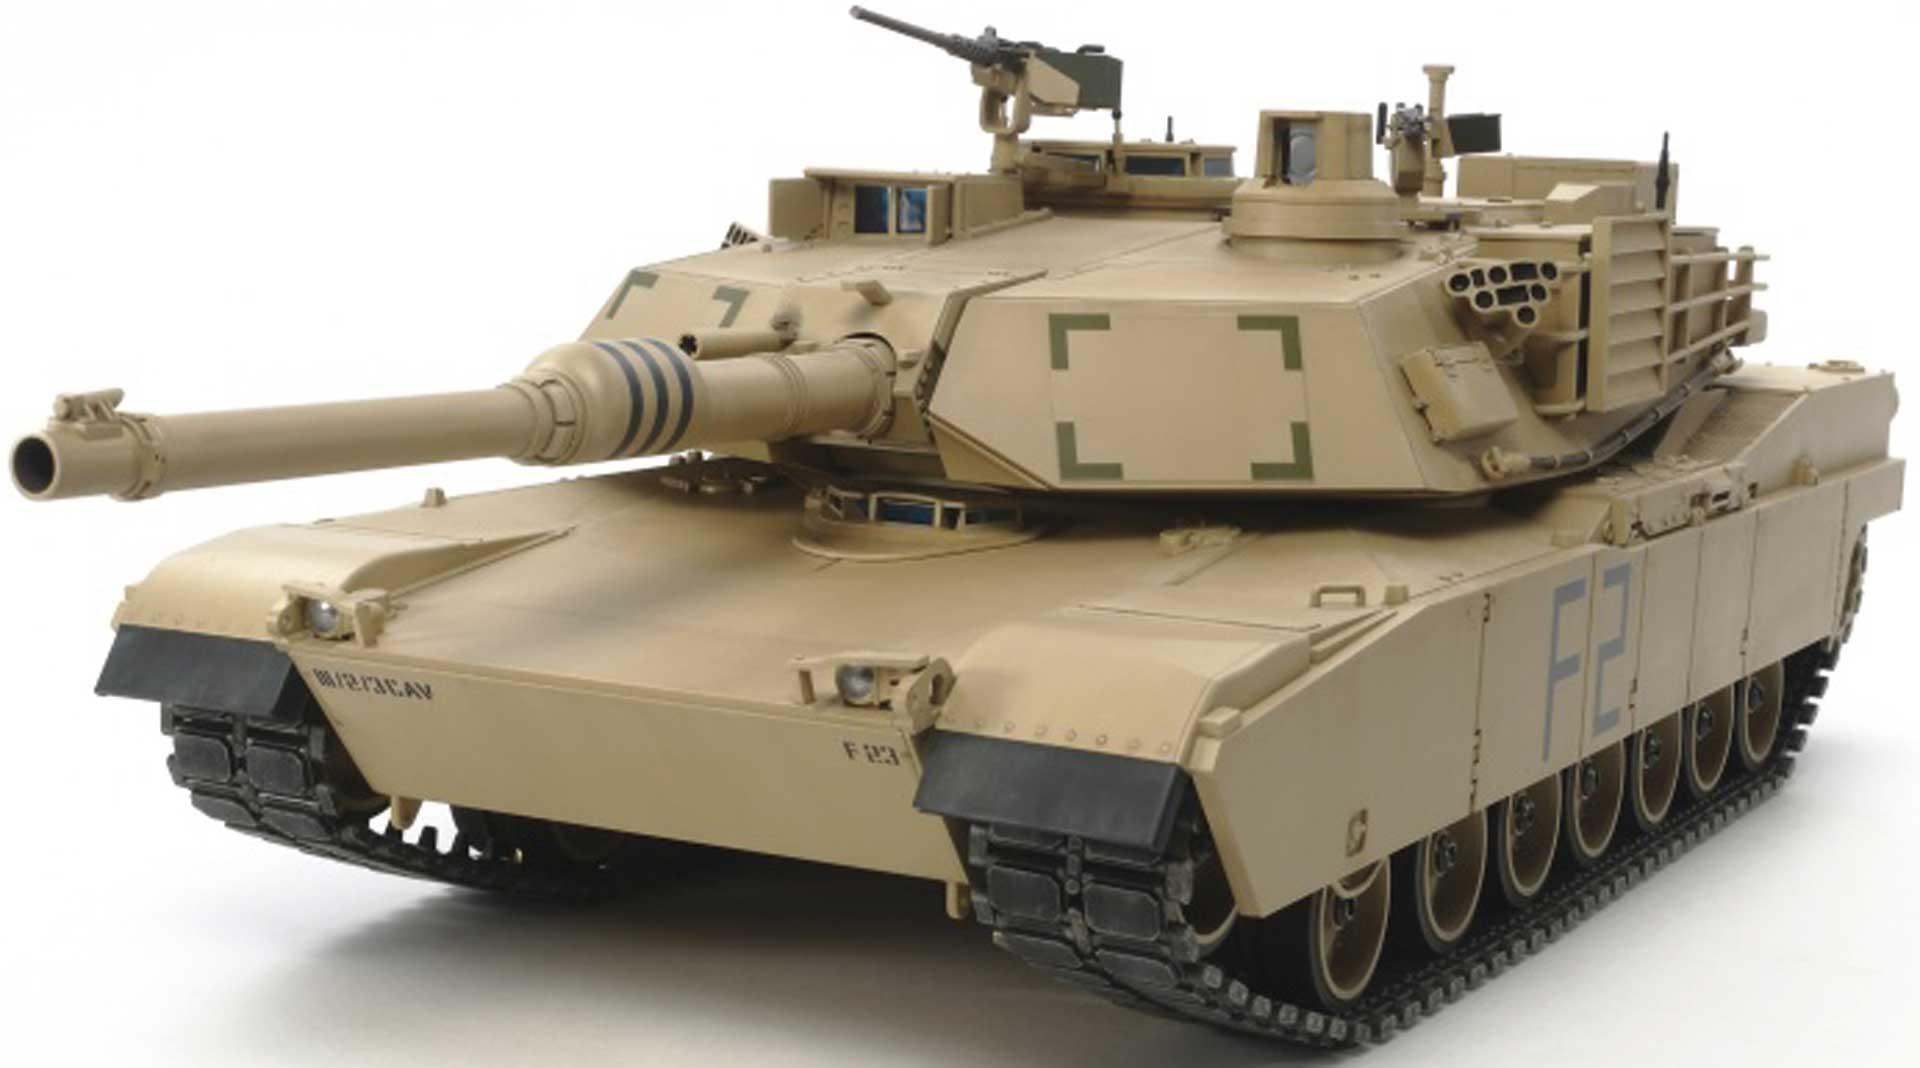 TAMIYA US KPZ M1A2 ABRAMS FULL OPTION 1/16 EP CONSTRUCTION KIT